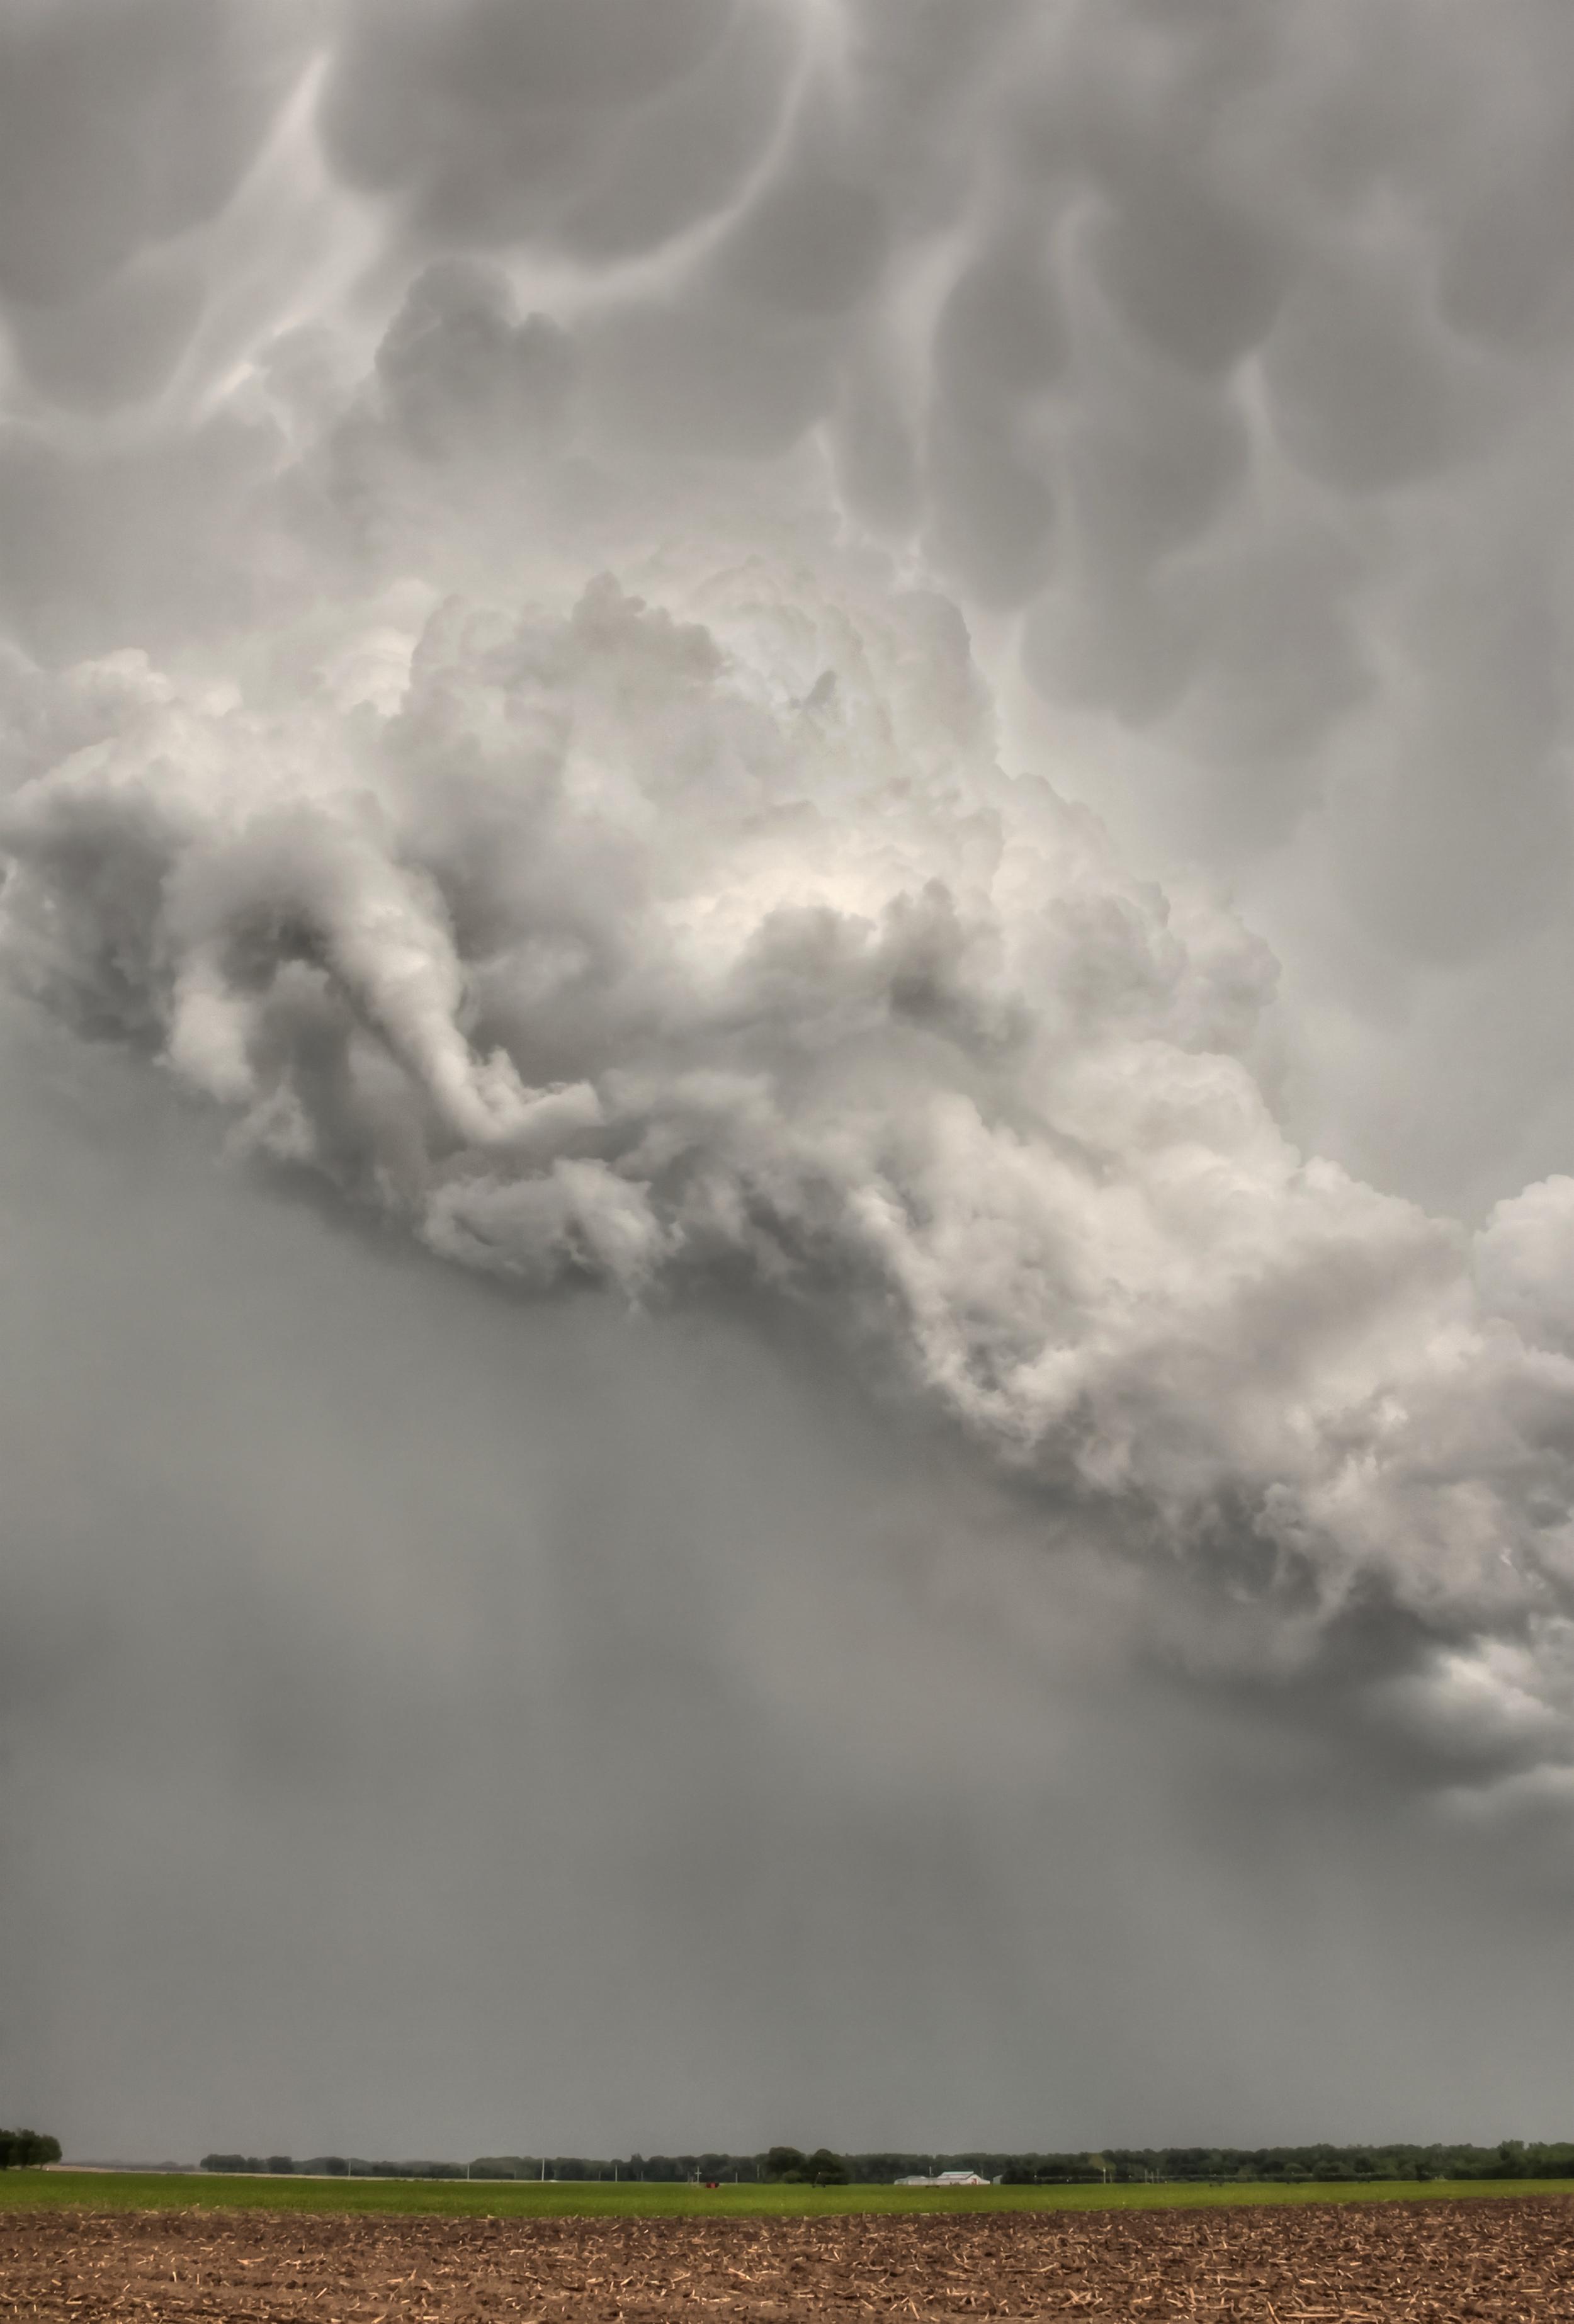 Funnel Cloud near Topeka, Kansas on May 21, 2011